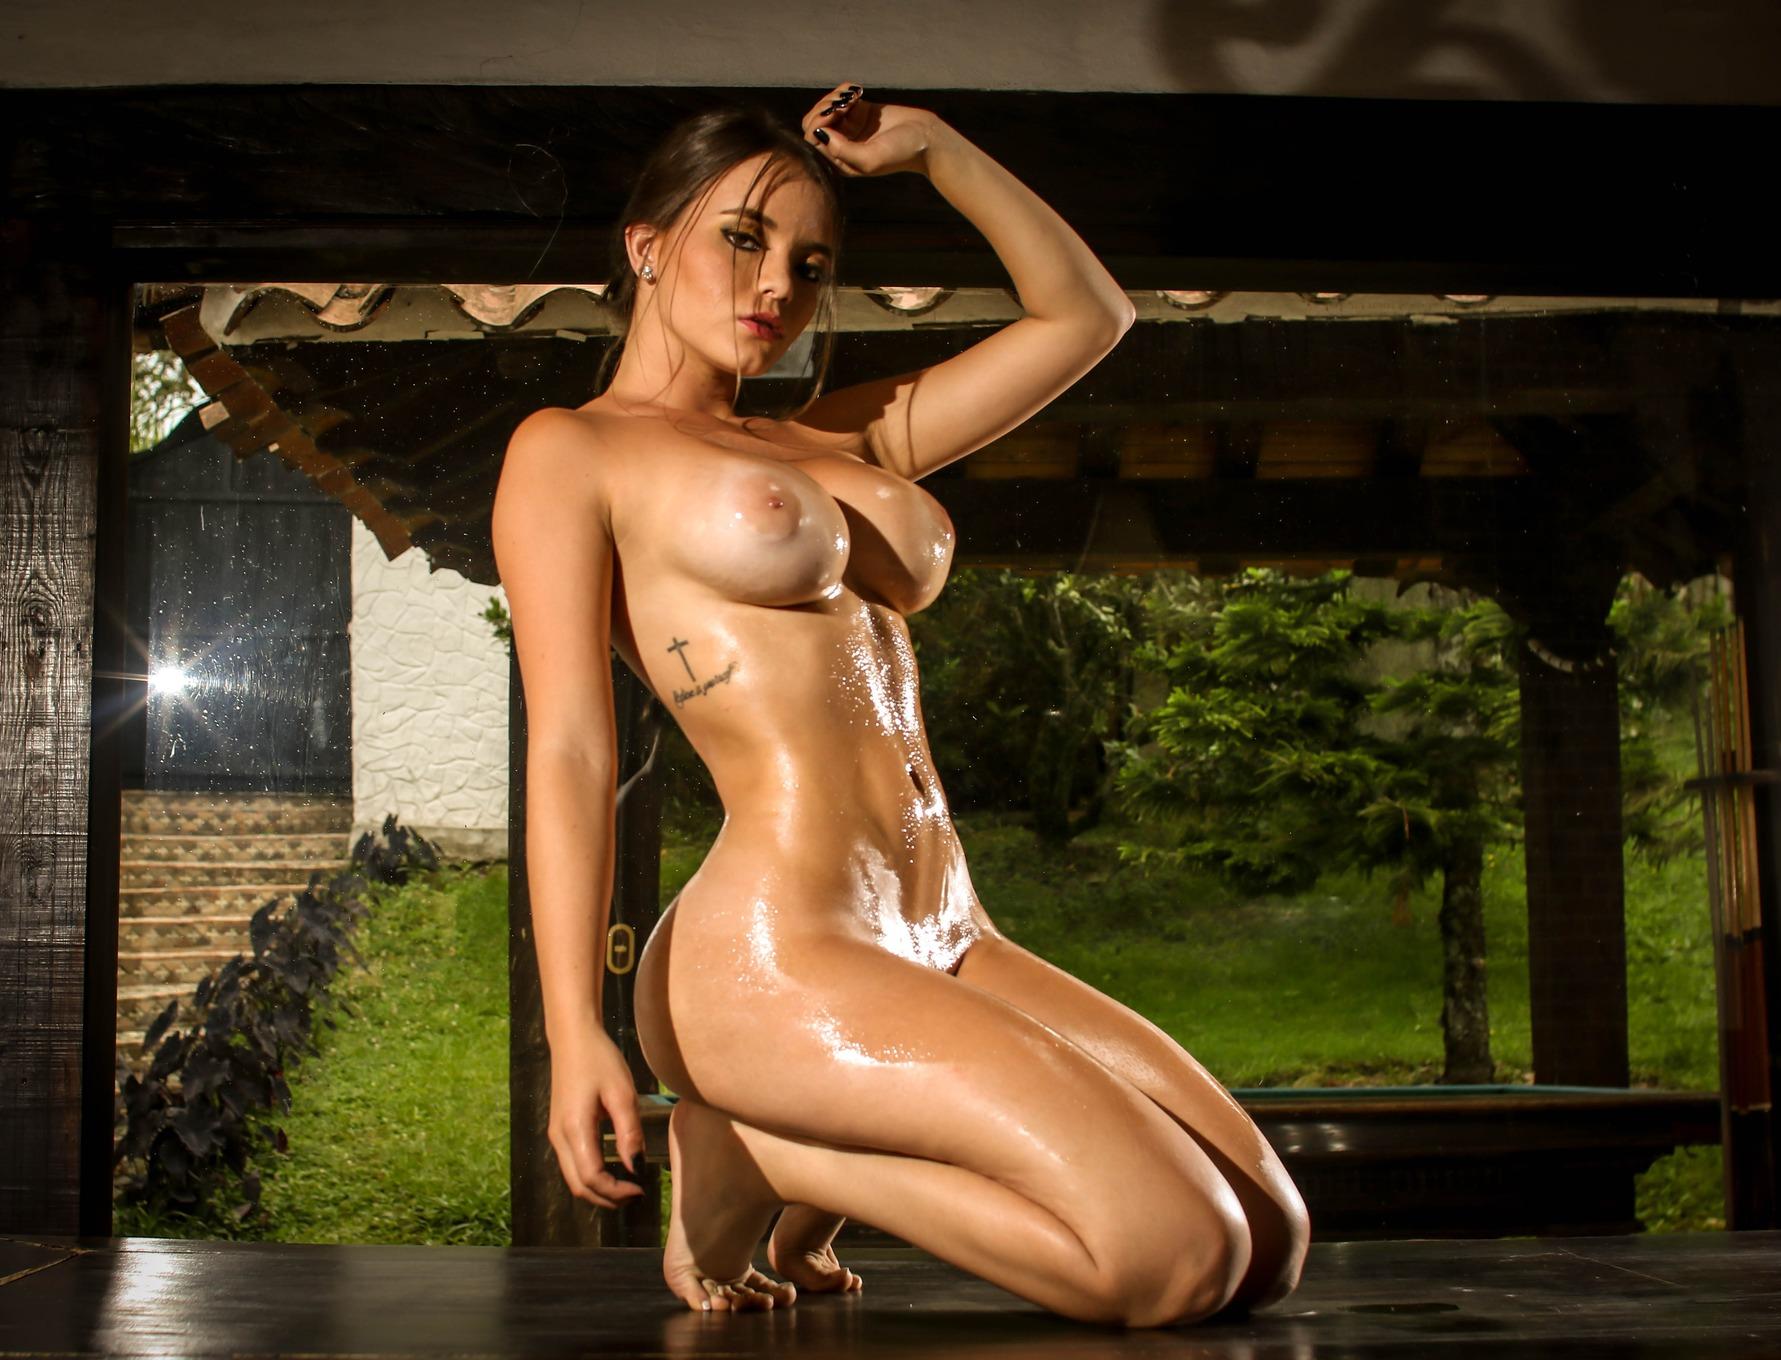 And naked pamela